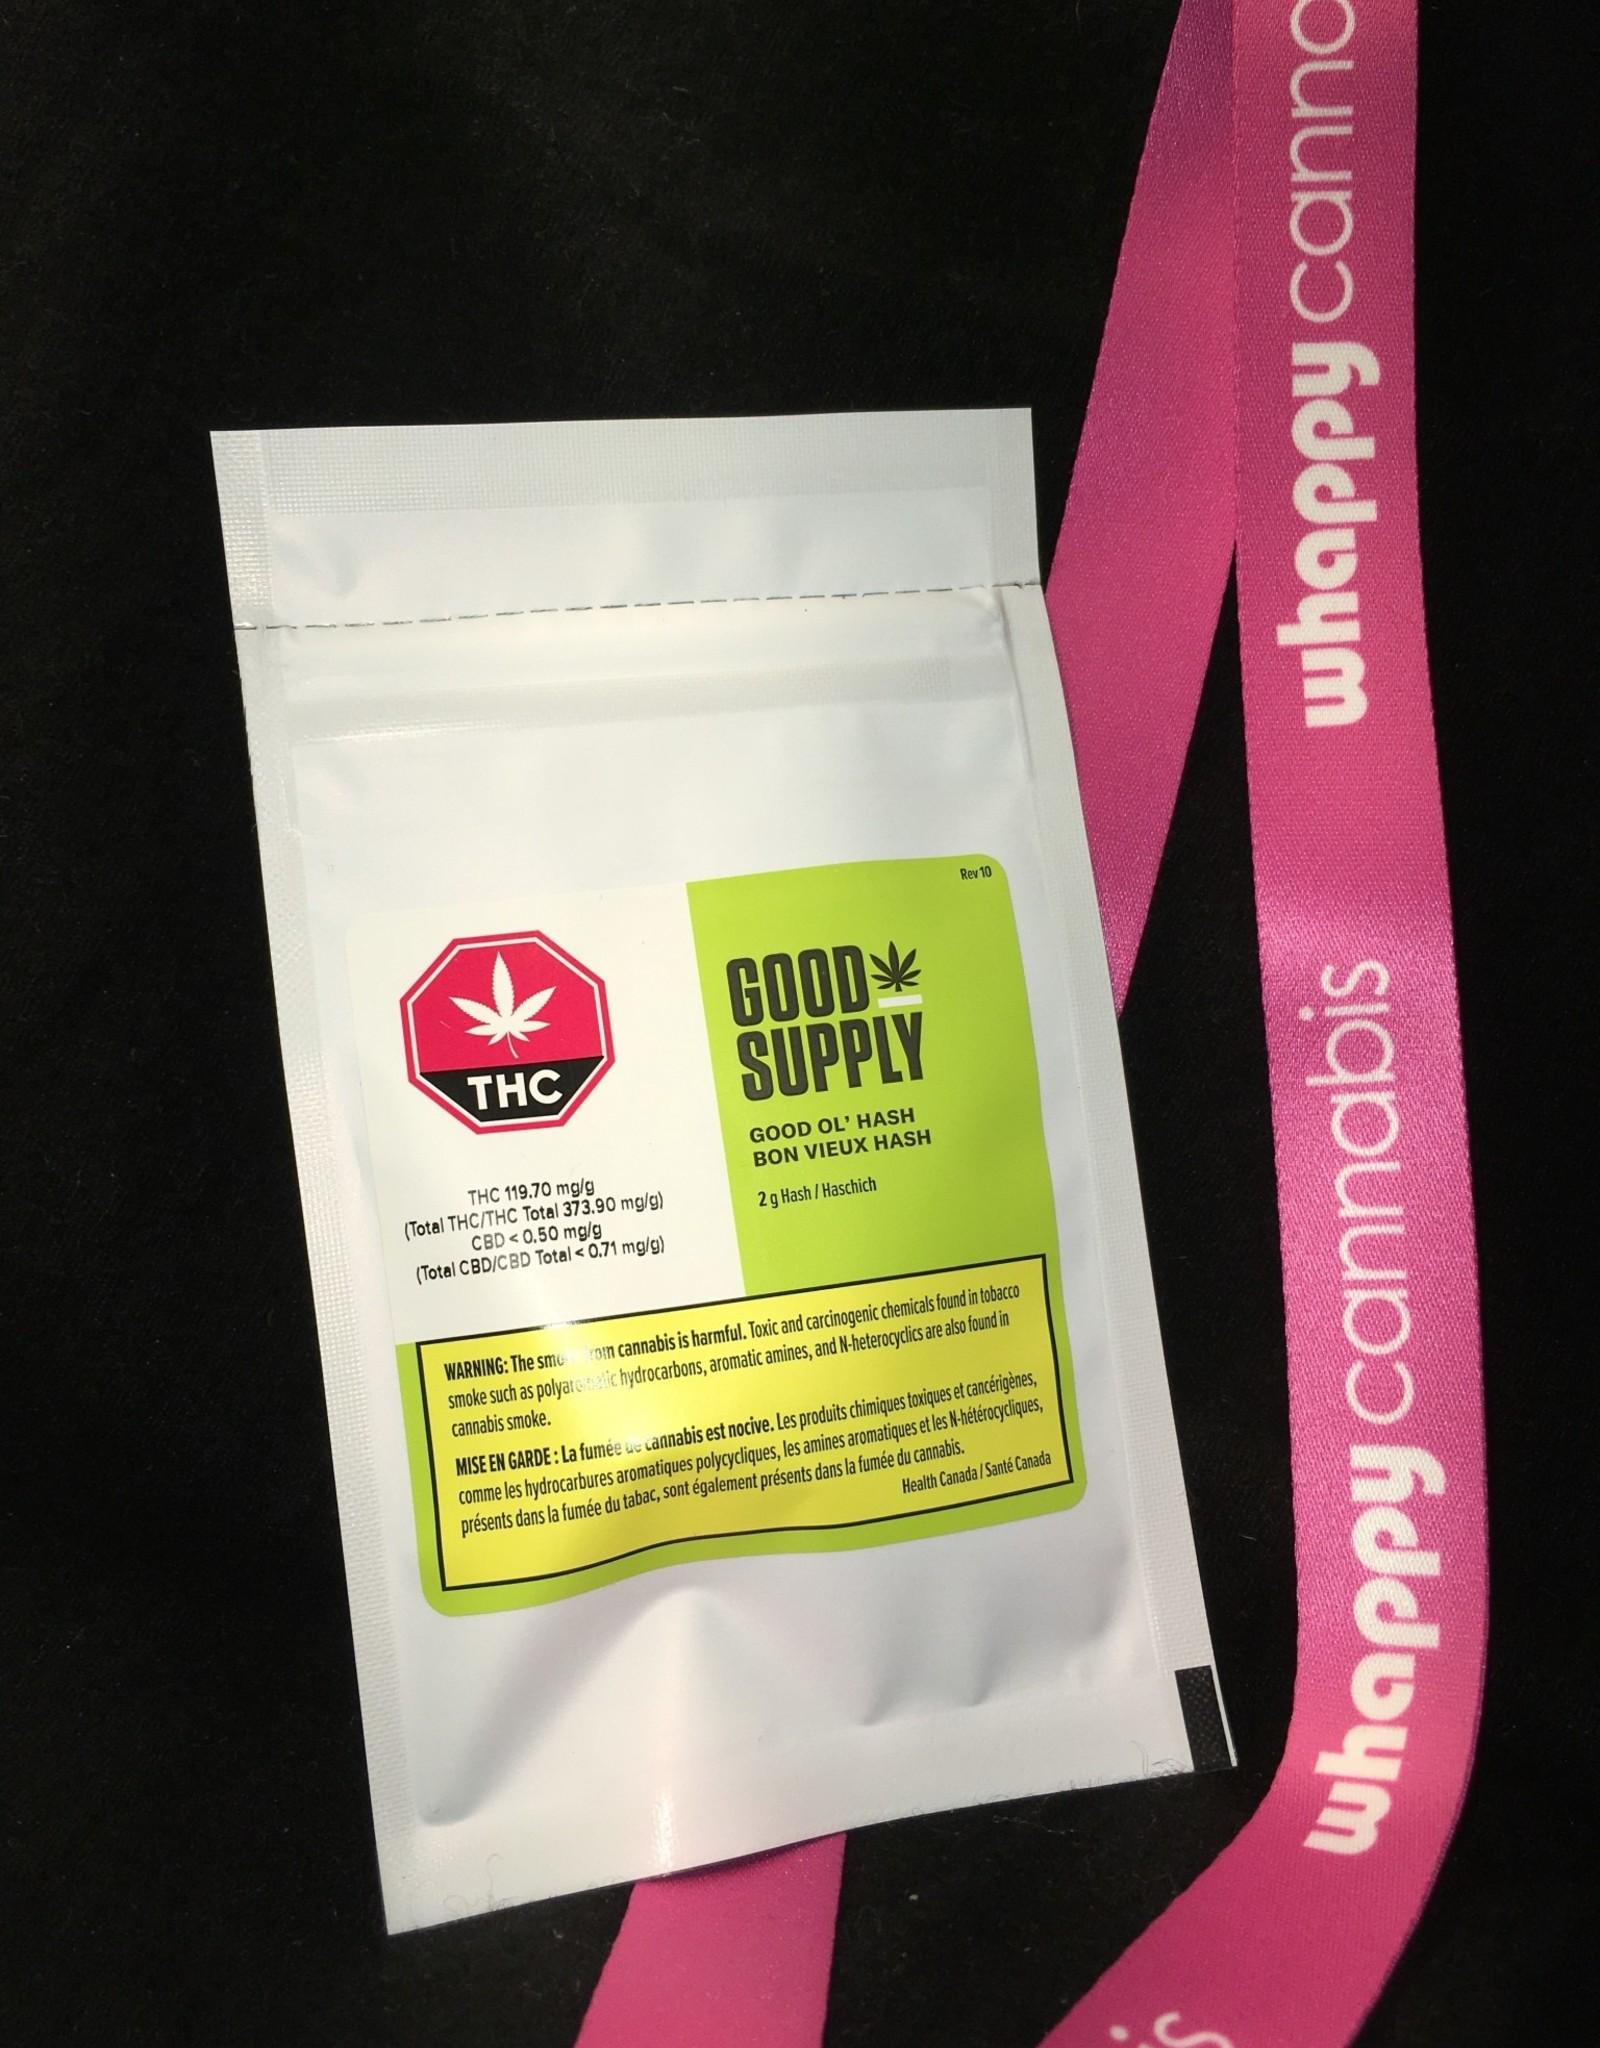 Good Supply Good Supply - Good Ol' Hash Blend 2g